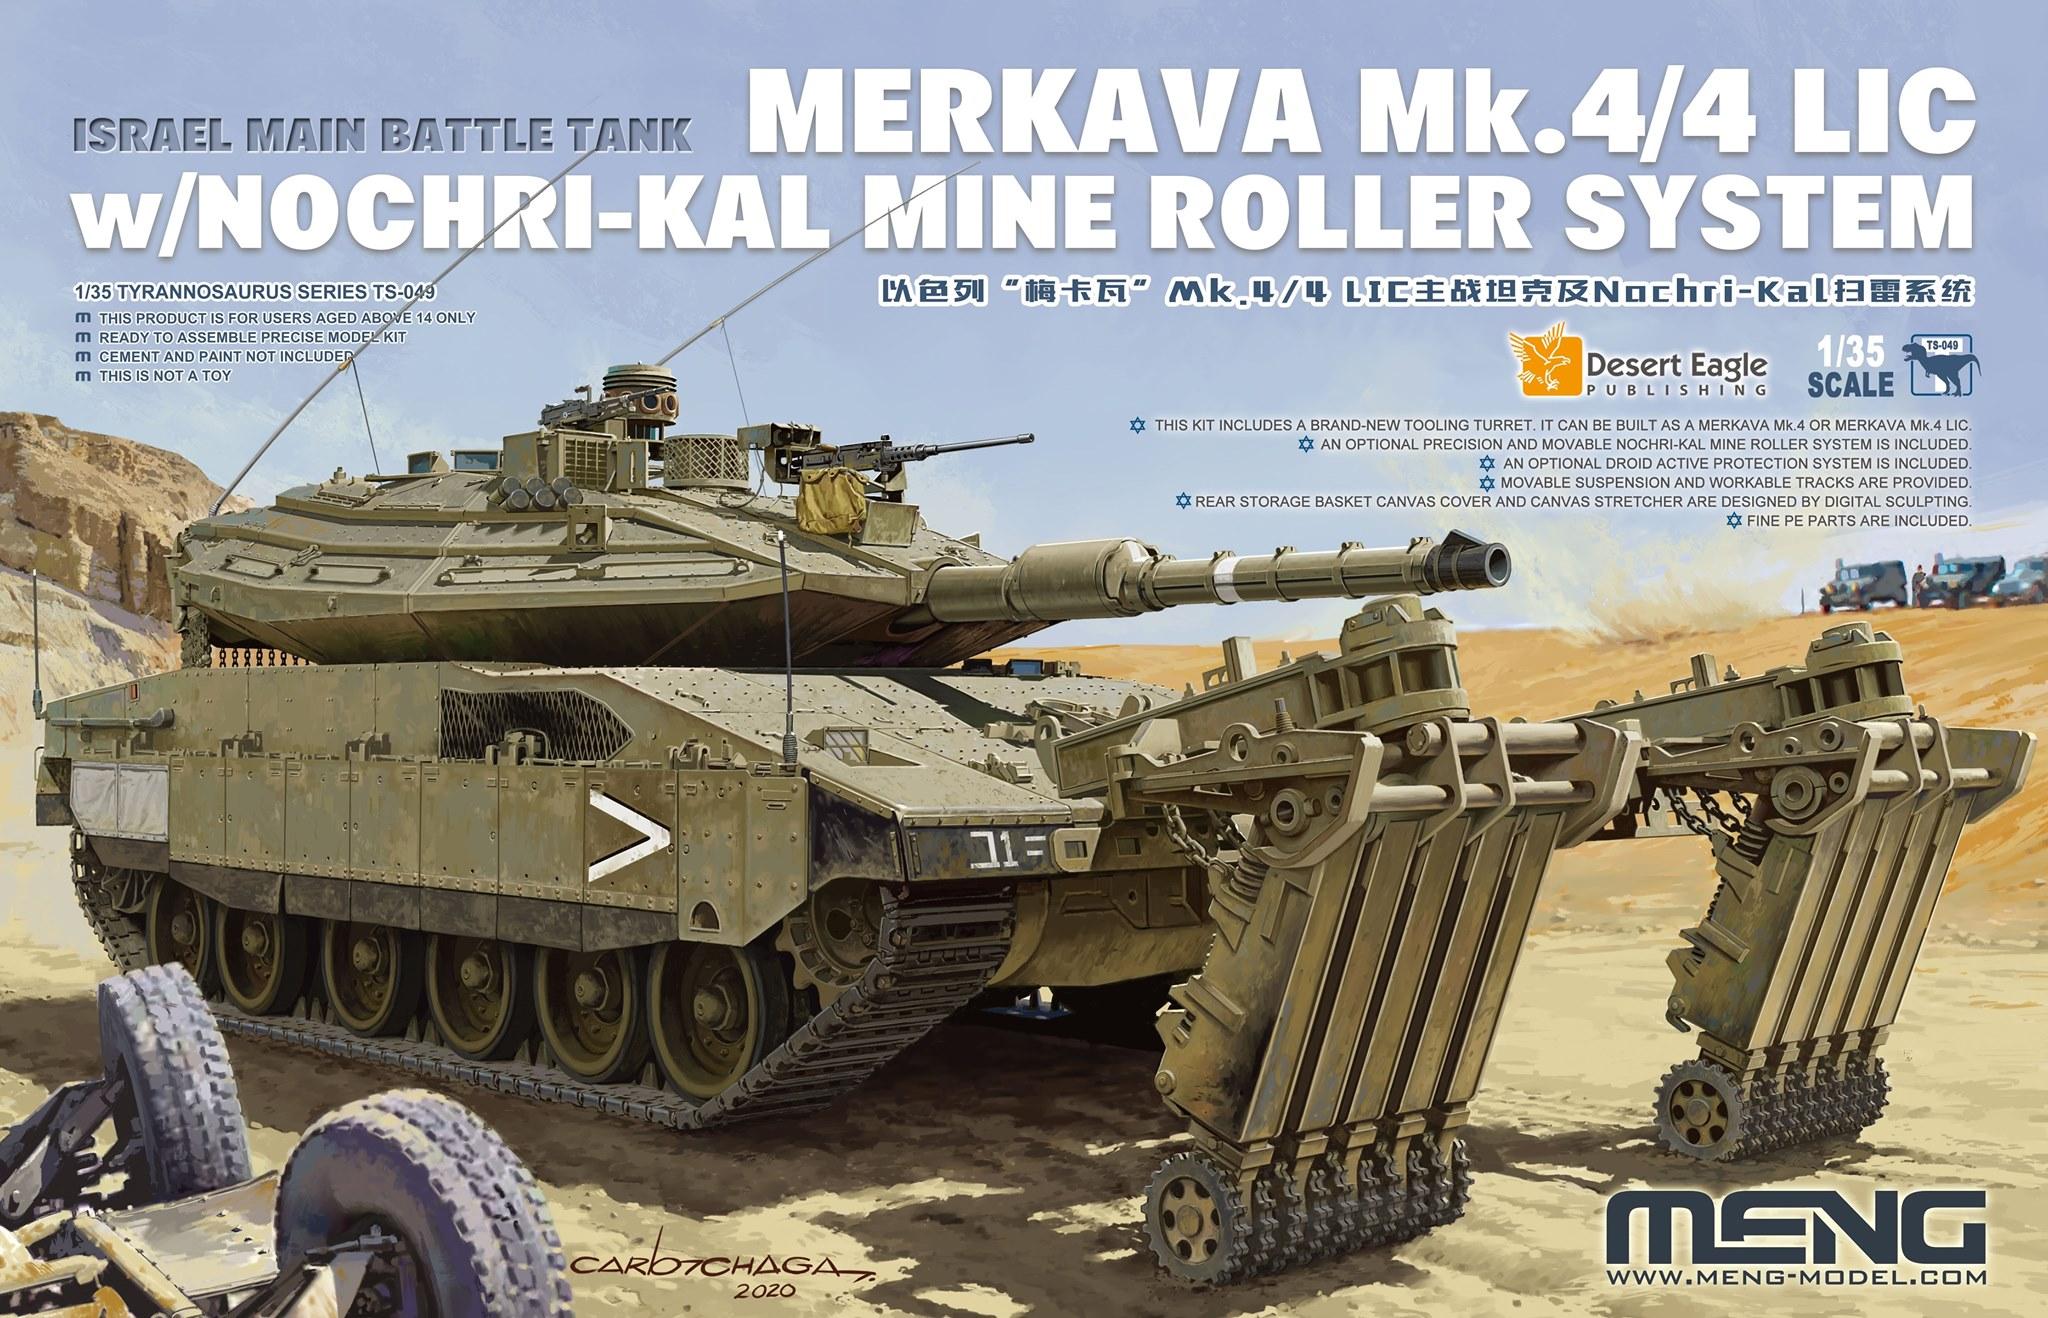 Meng 1/35 Israel Main Battle Tank Merkava Mk.4/4LIC w/Nochri-Kal Mine Roller System